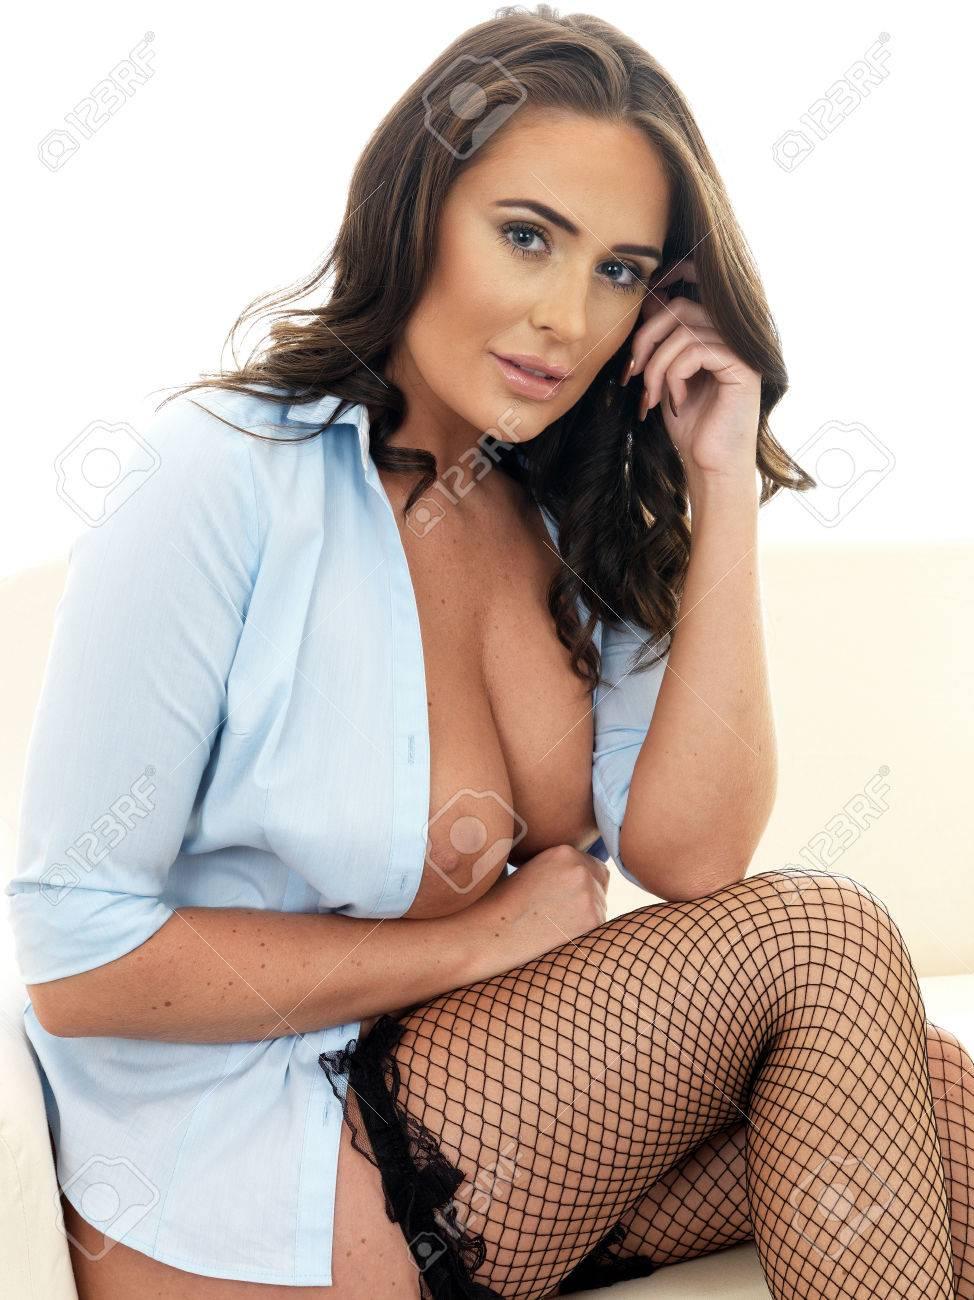 women-hispanic-hot-naked-on-bed